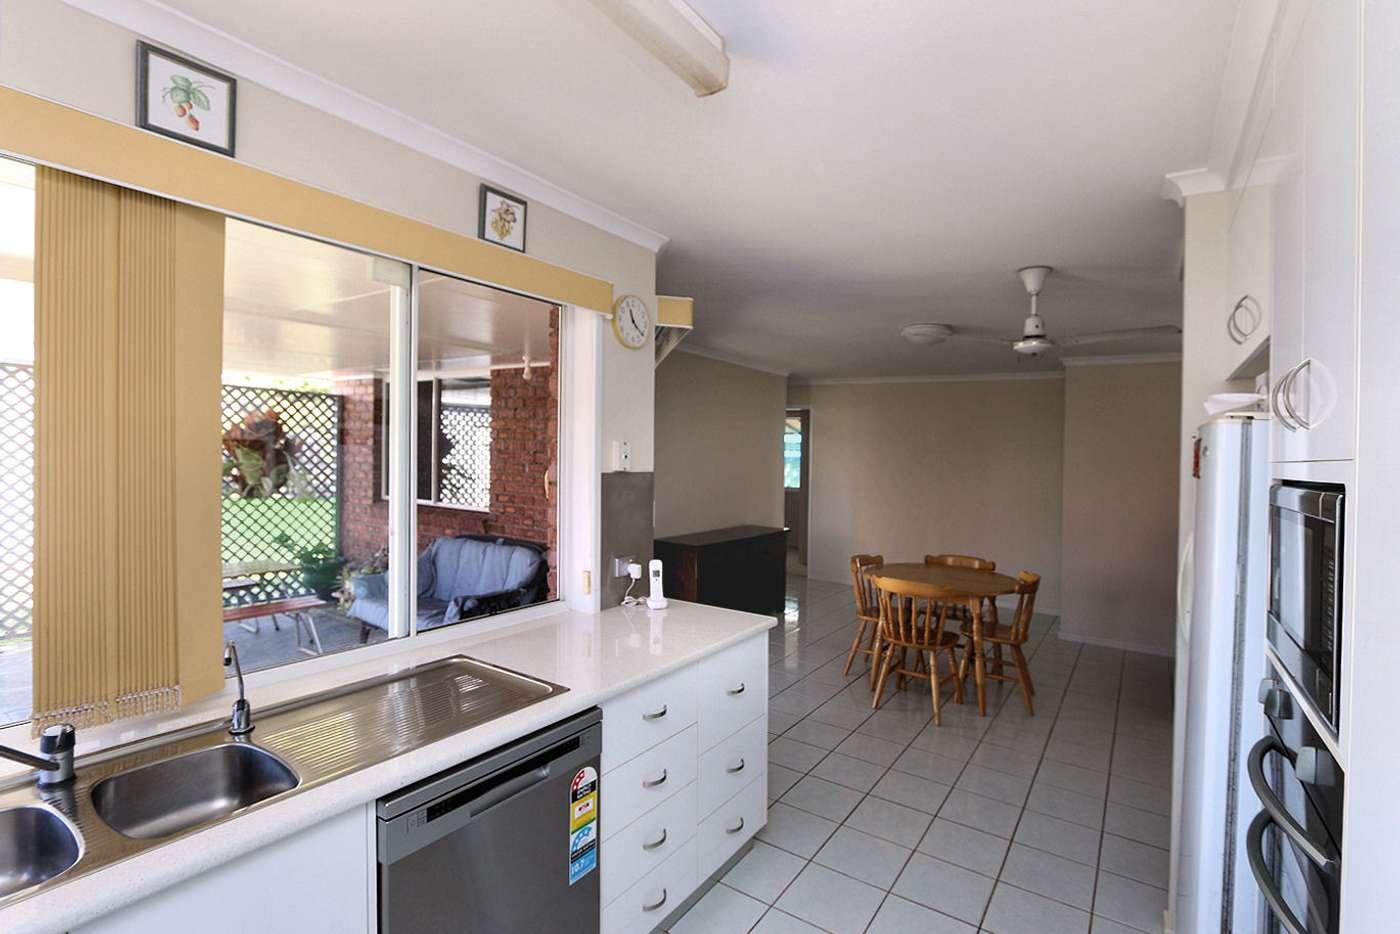 Sixth view of Homely house listing, 21 Bargara Lakes Dr, Bargara QLD 4670